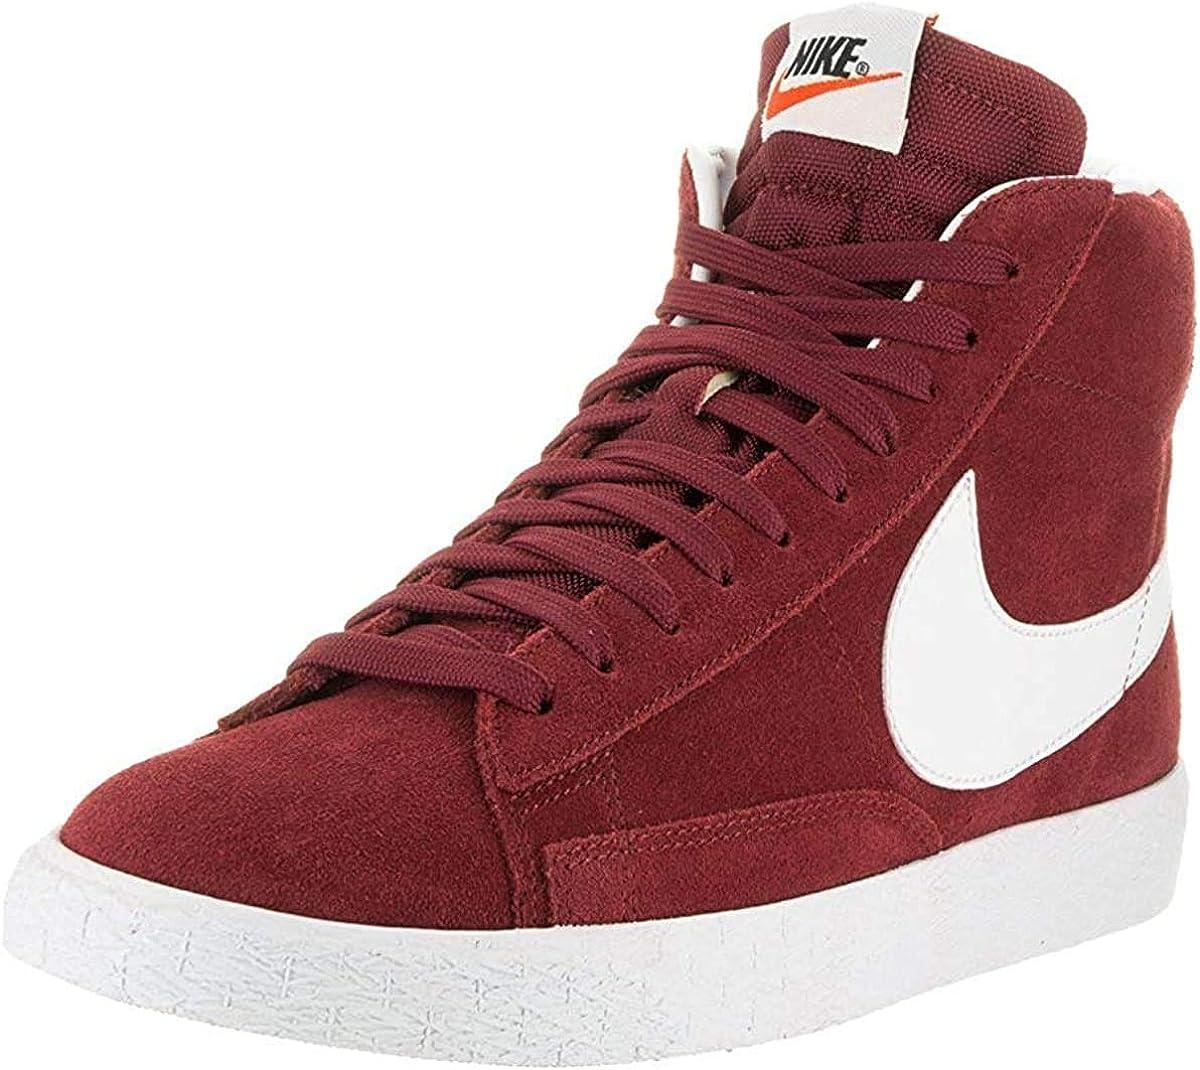 Nike Women's Fitness Shoes Habanero Red / White-black